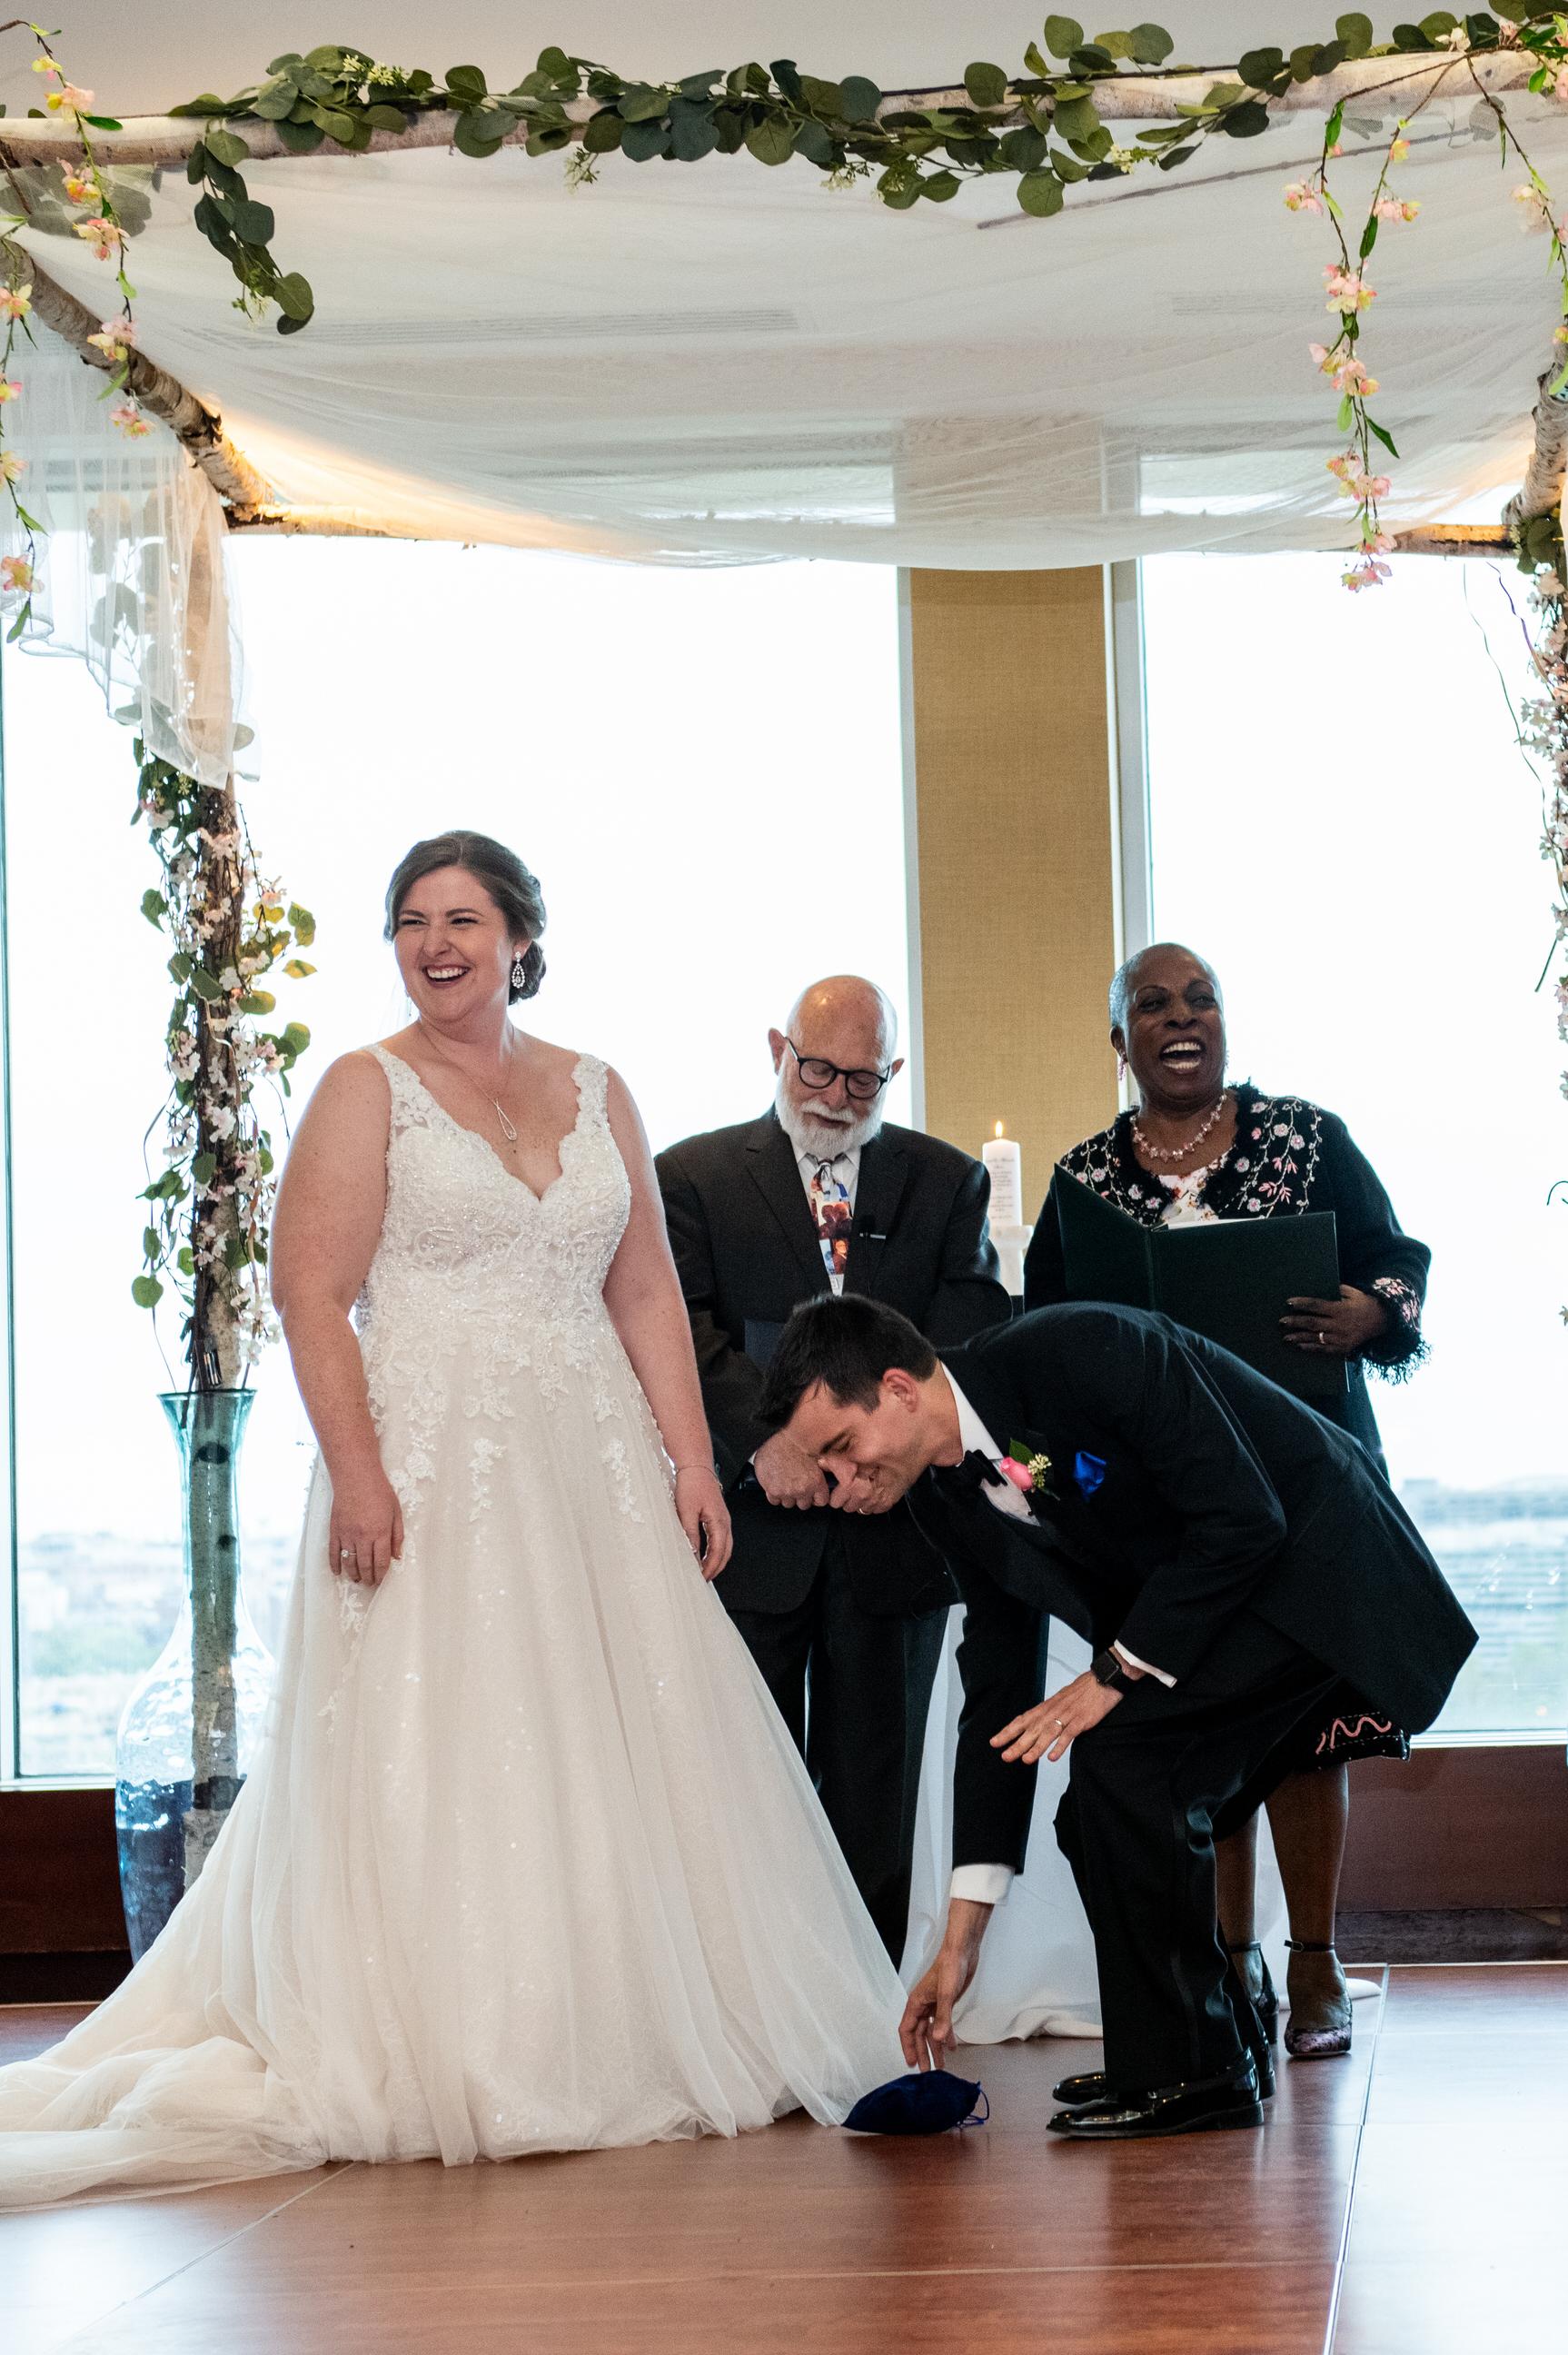 MarriottDC-Sarah&Sasha-Ceremony-1099.jpg